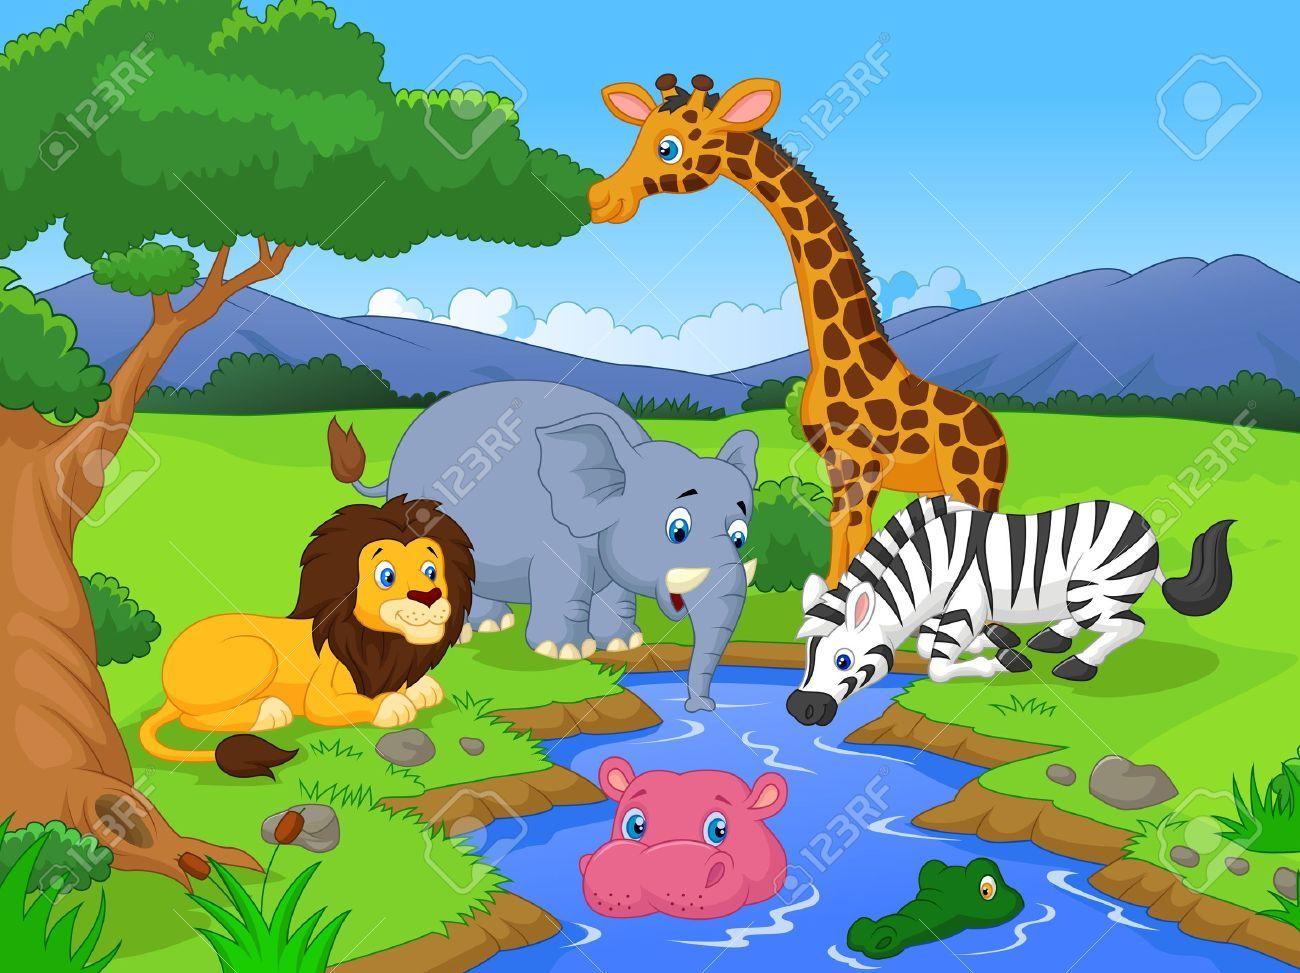 Fondos De Animales Animados: 3 Photo Of 28 For Cartoon Savannah